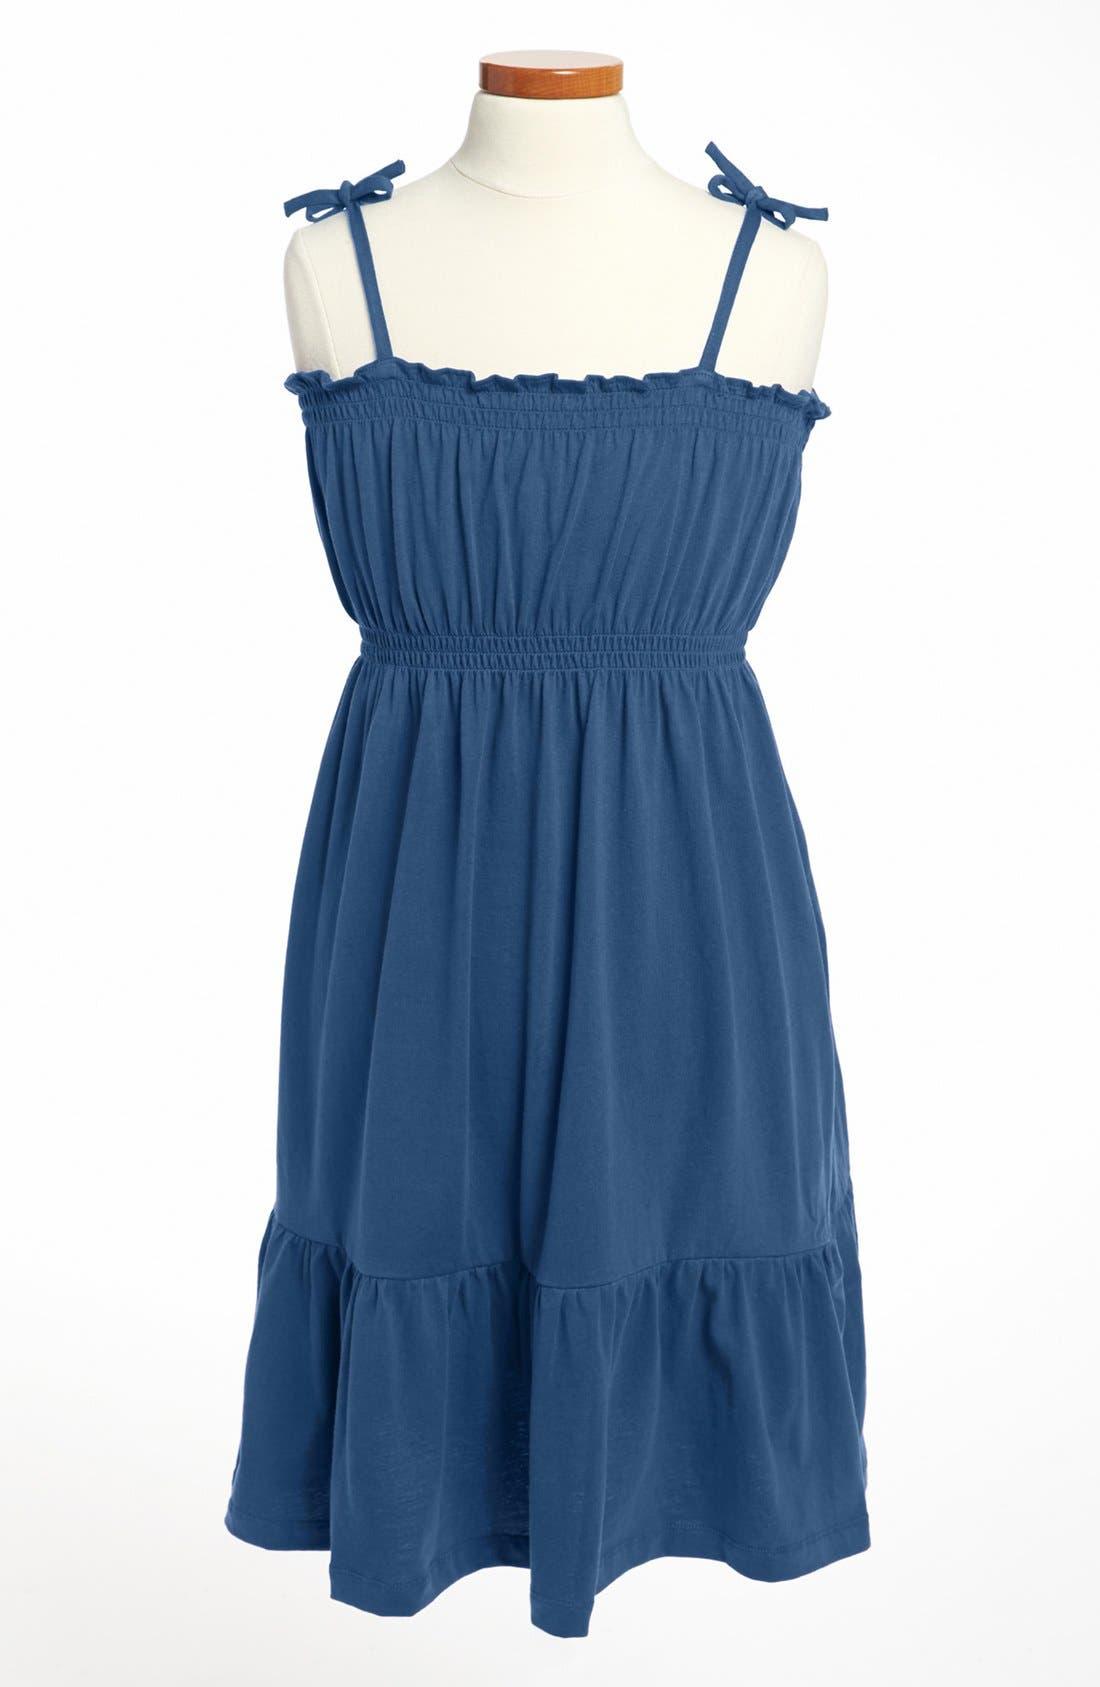 Alternate Image 1 Selected - Peek 'Brighton' Dress (Toddler, Little Girls & Big Girls)